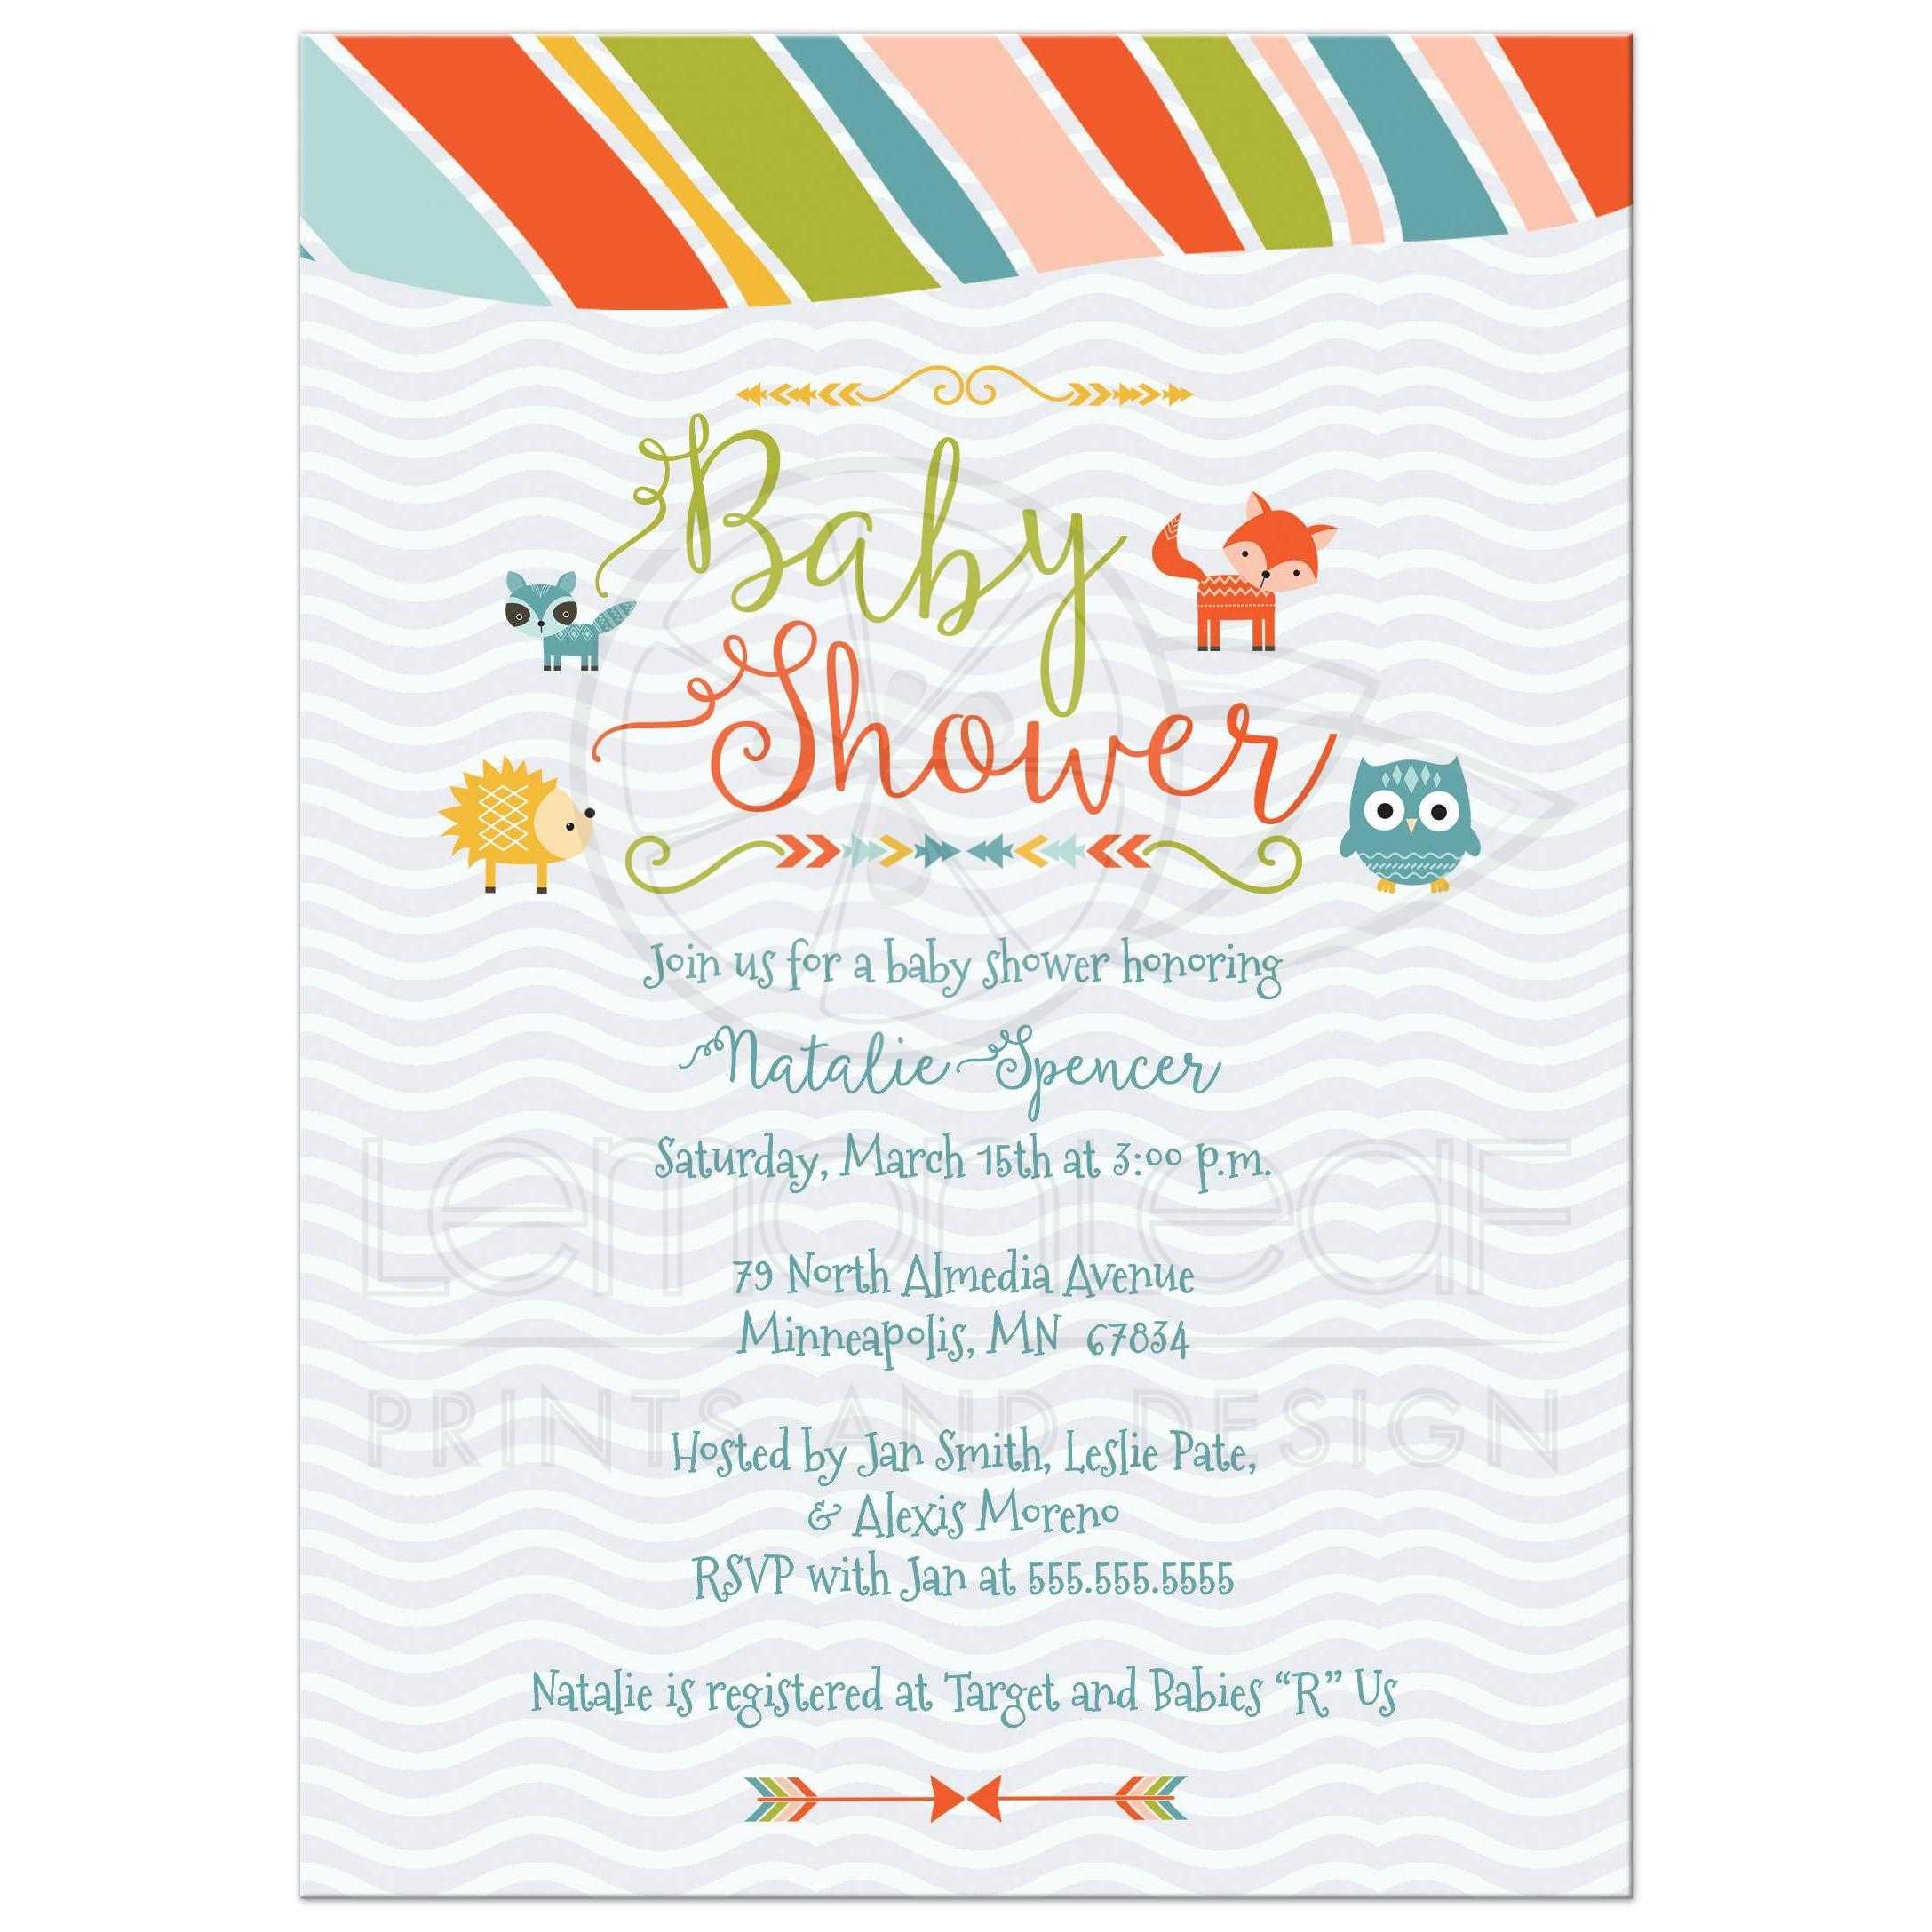 Baby Shower Invitation Colorful Woodland Tribal Design